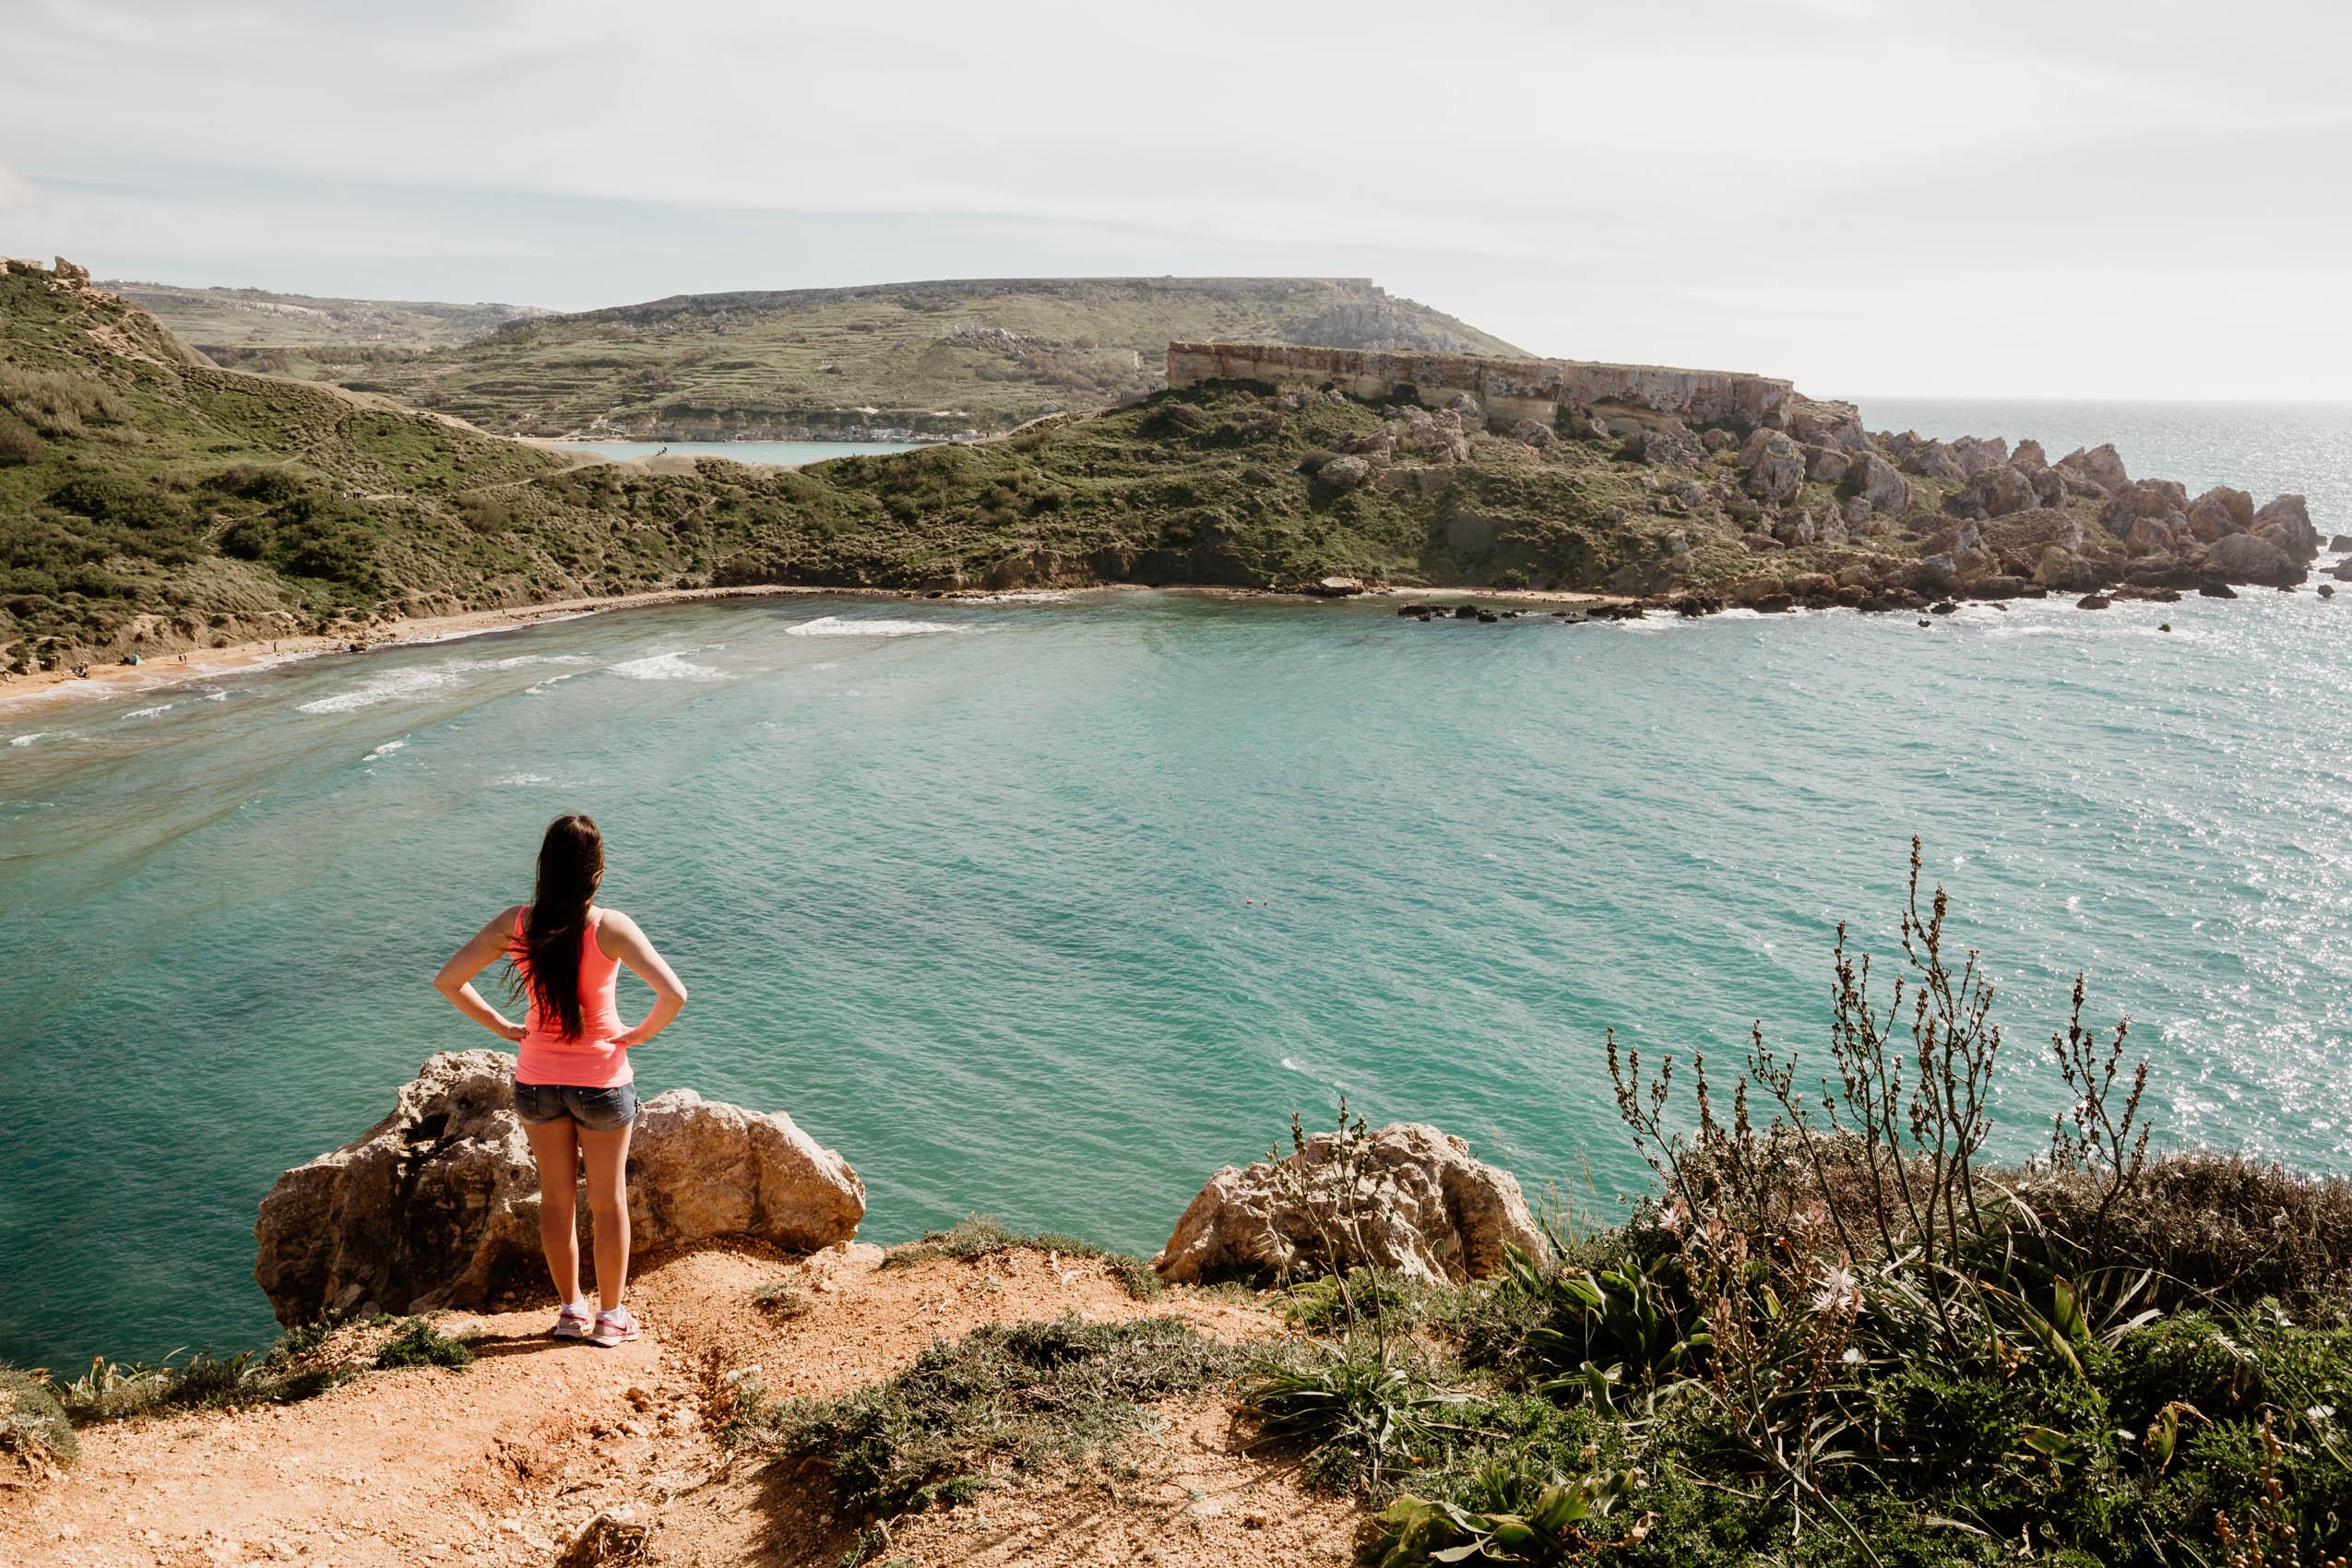 Malta, part 5- Popeye Village, Golden Bay, Ghajn Tuffieha Bay